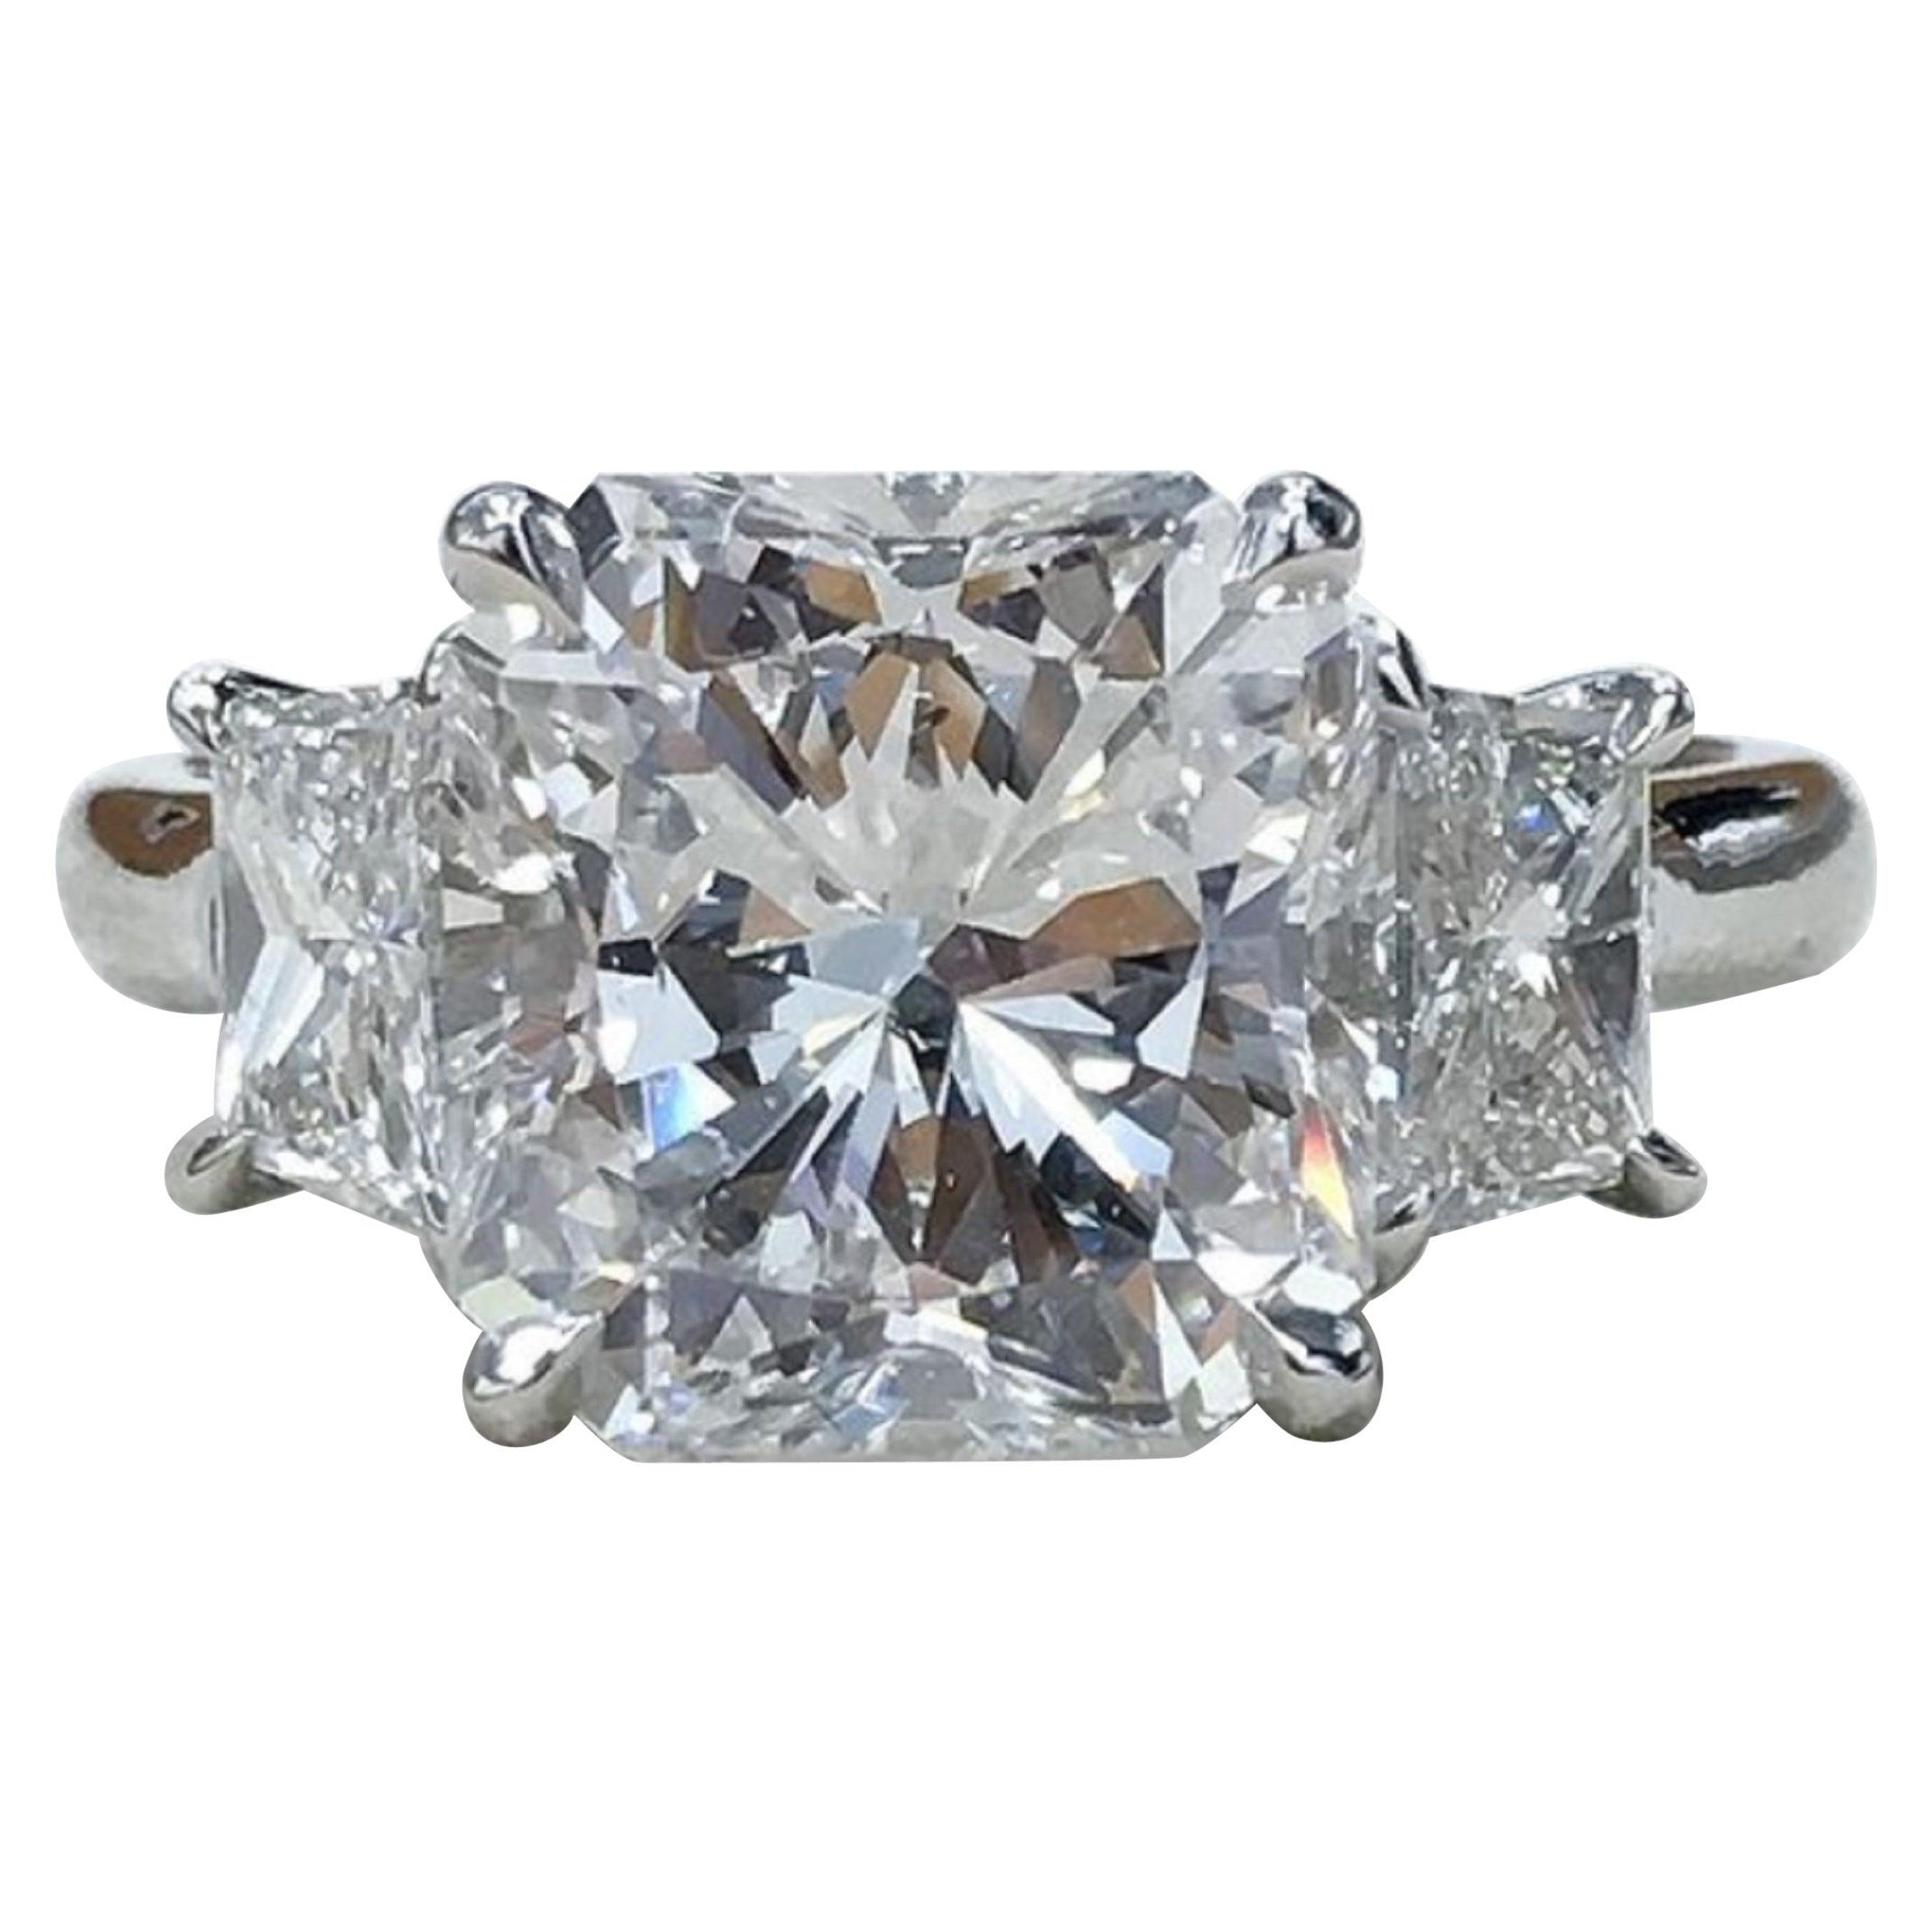 GIA Certified 2.50 Carat Radiant Cut Diamond Ring VVS1 F Triple Excellent Cut